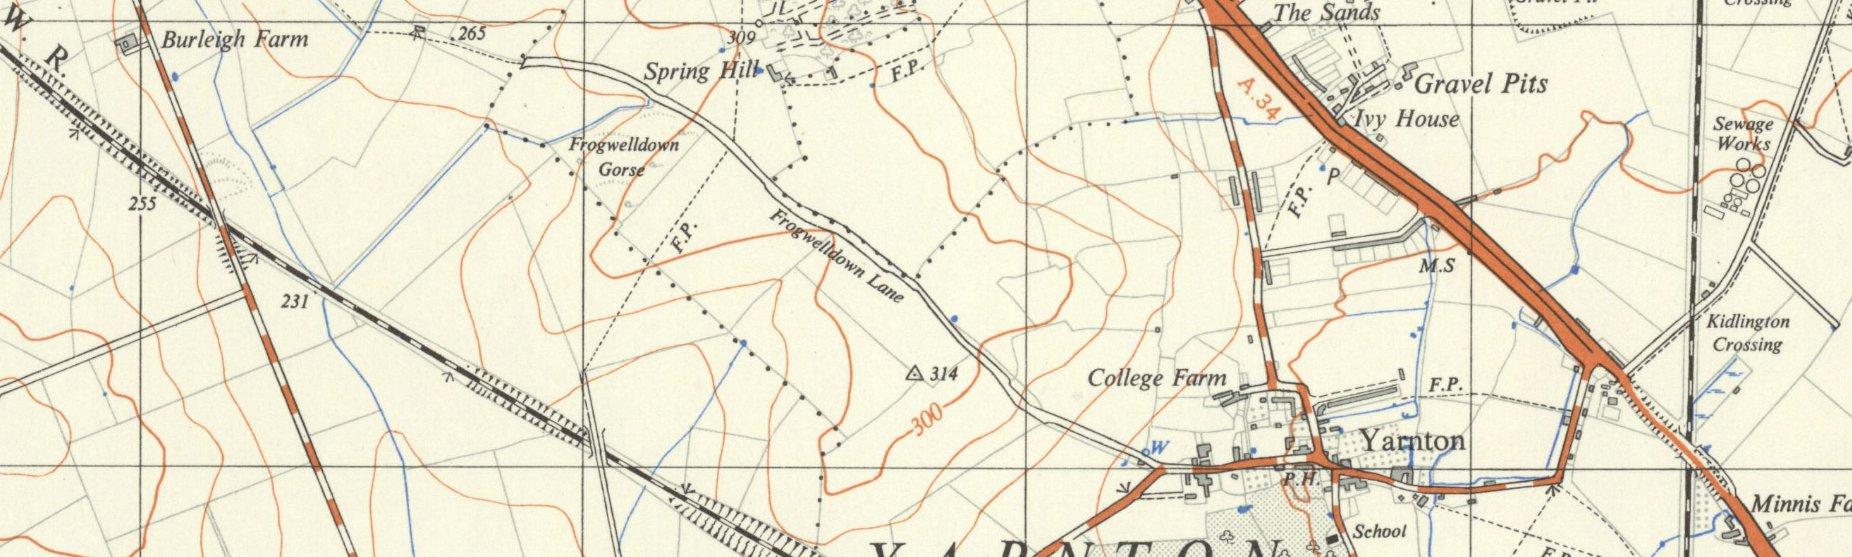 Map circa 1955, featuring Frogwelldown Lane